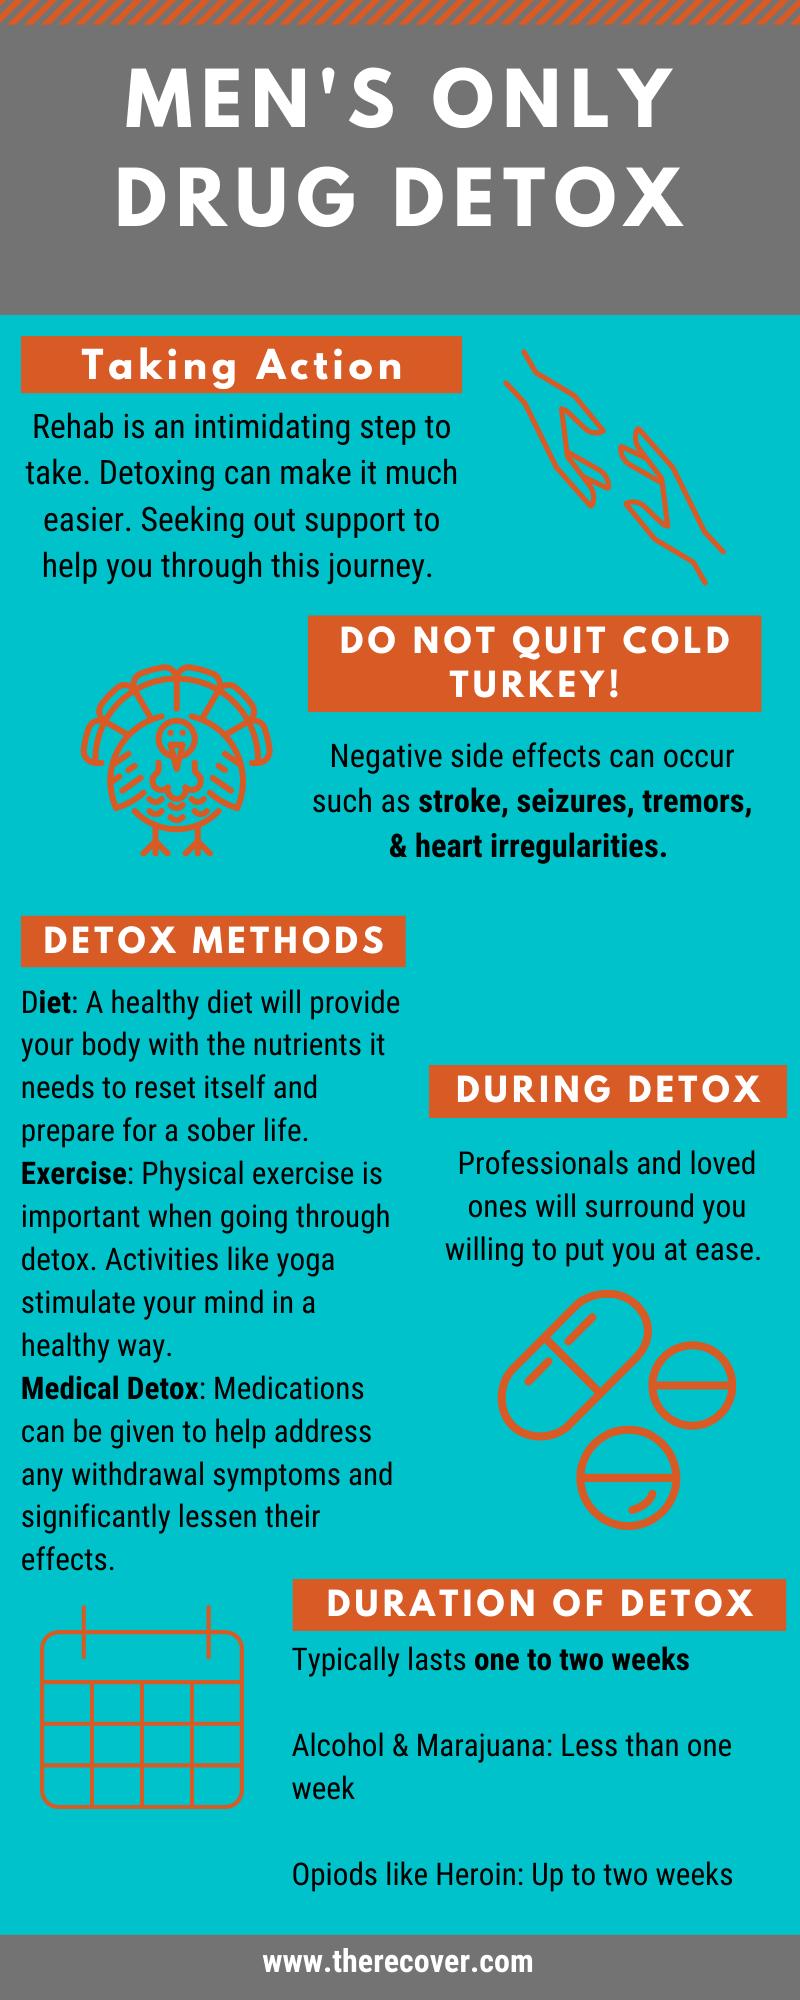 Men's only Detox Infographic